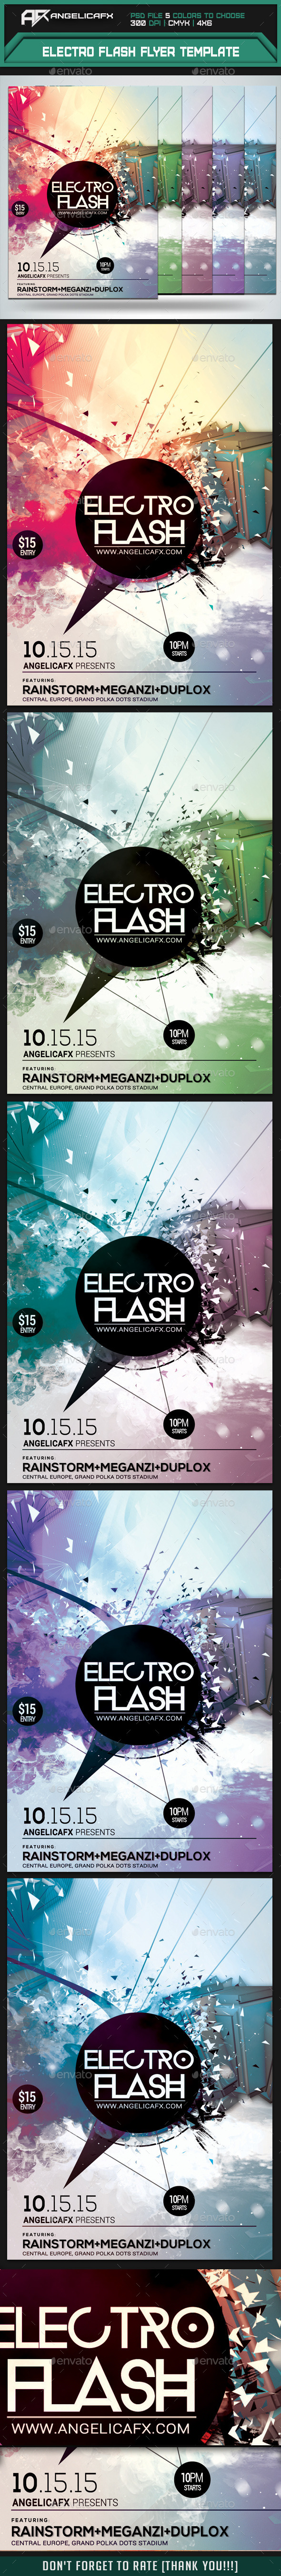 Electro Flash Flyer Template - Flyers Print Templates